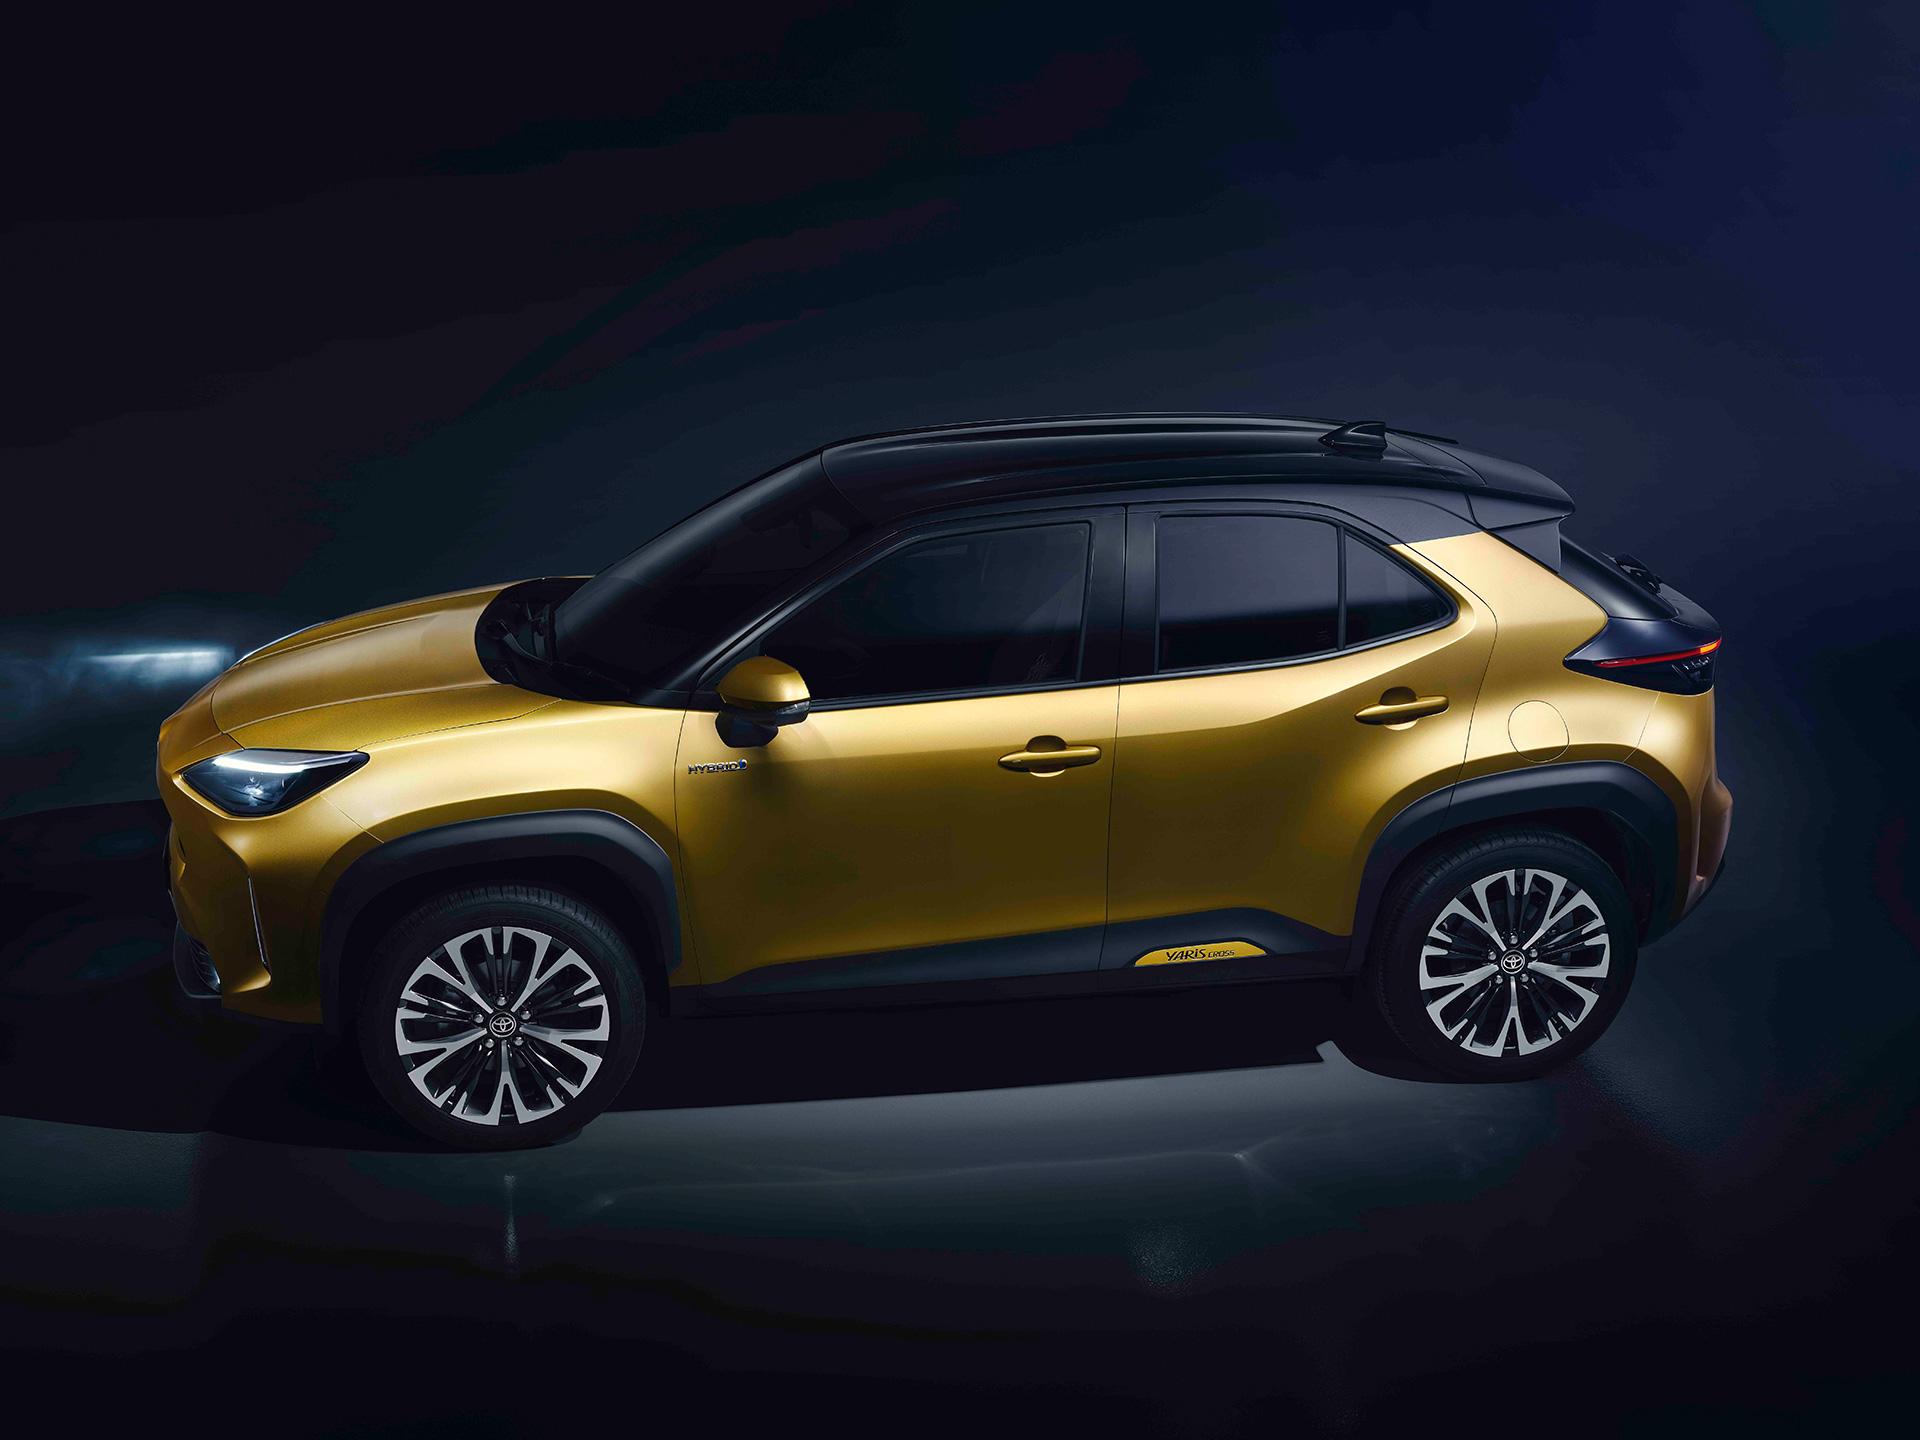 Toyota's Yaris Cross Makes World Debut - Image 2